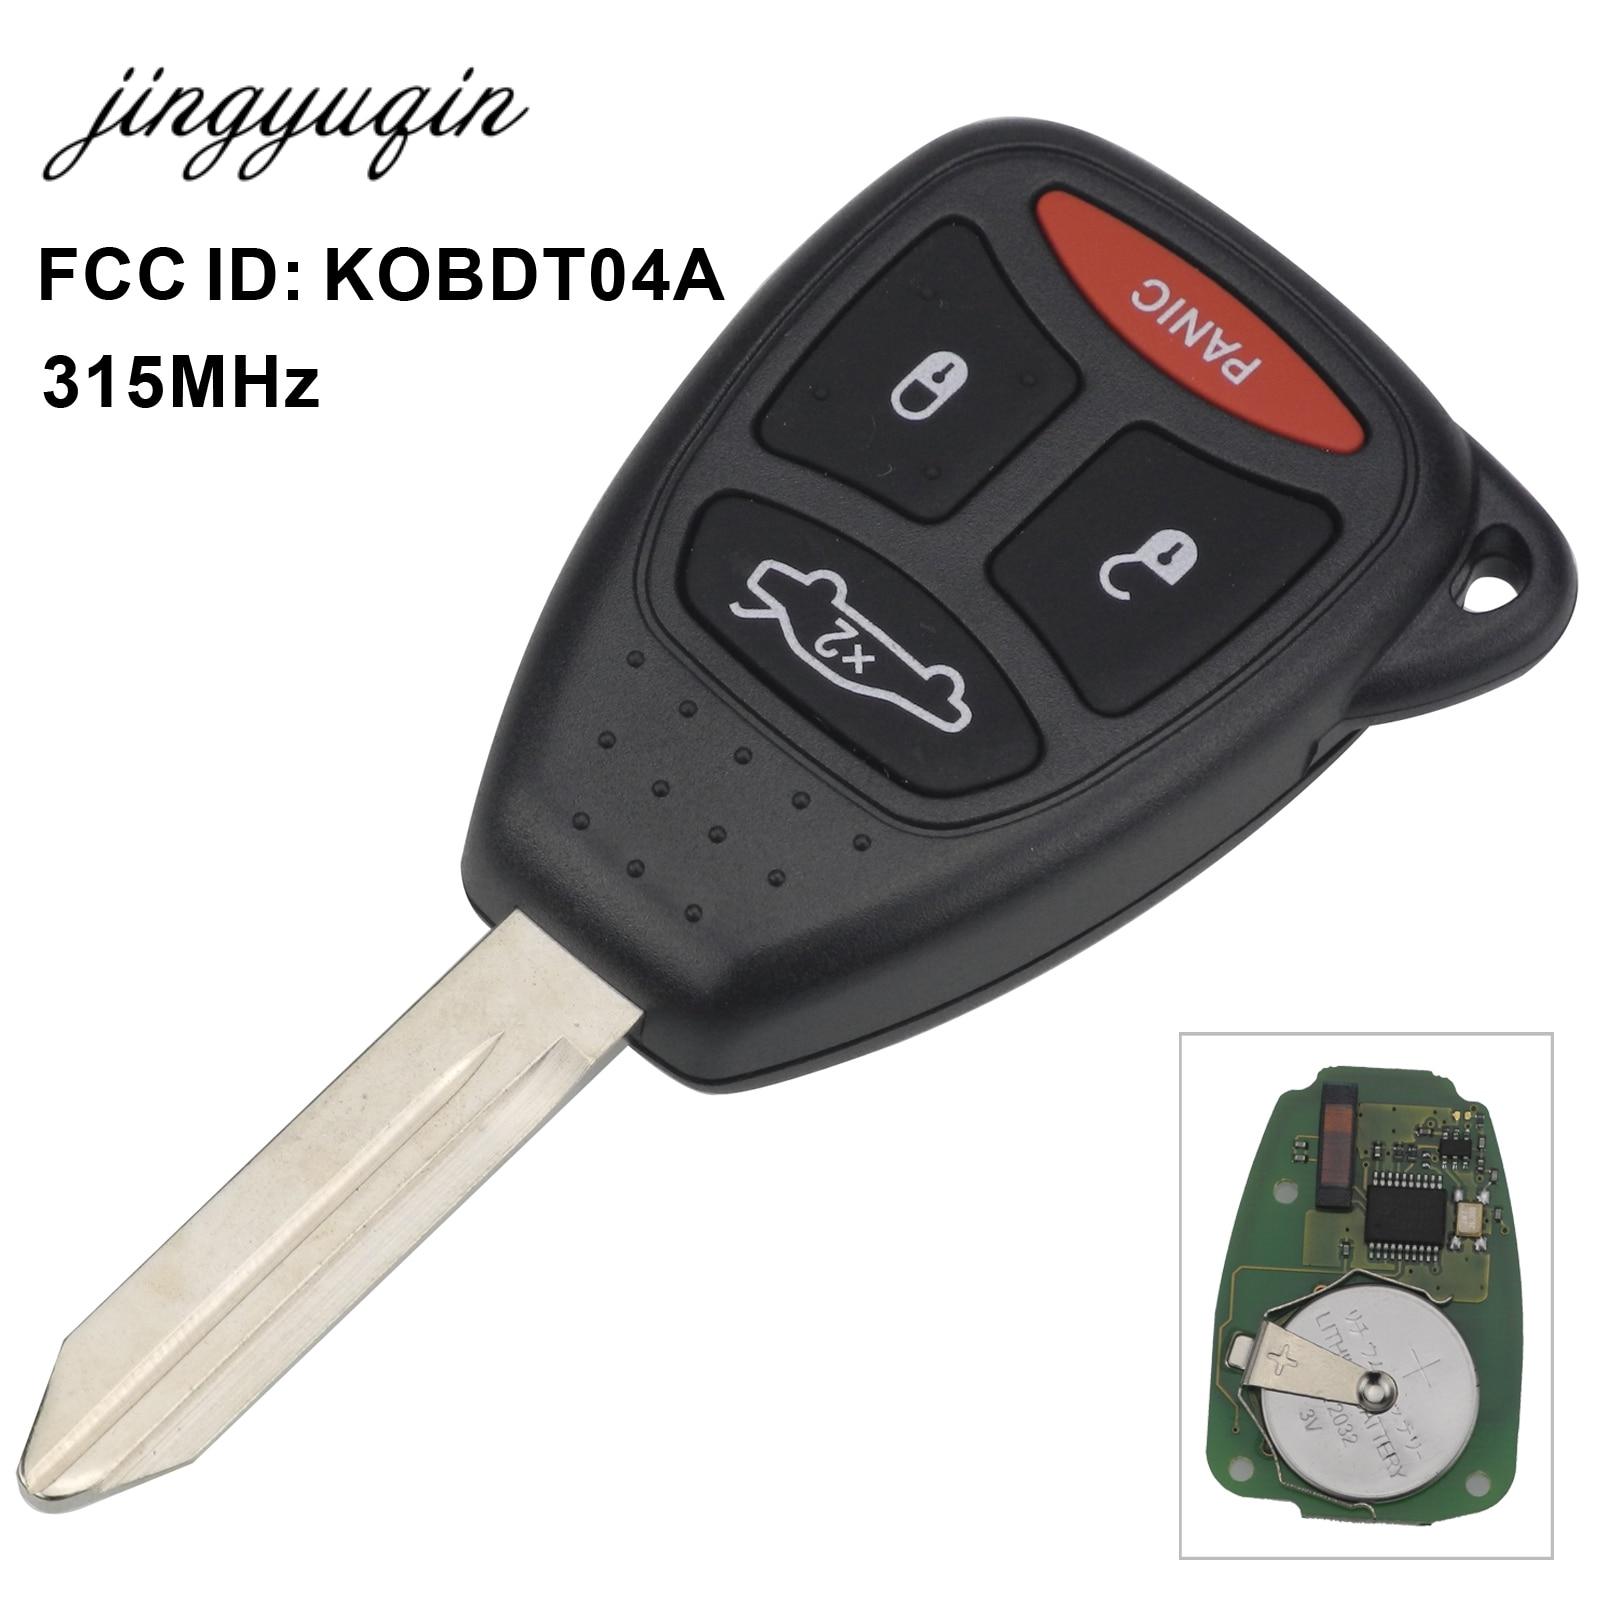 jingyuqin 315mhz KOBDT04A Remote Car key 3/4 Button for Dodge Chrysler Jeep Dakota Durango Charger 300 Aspen Grand Cherokee